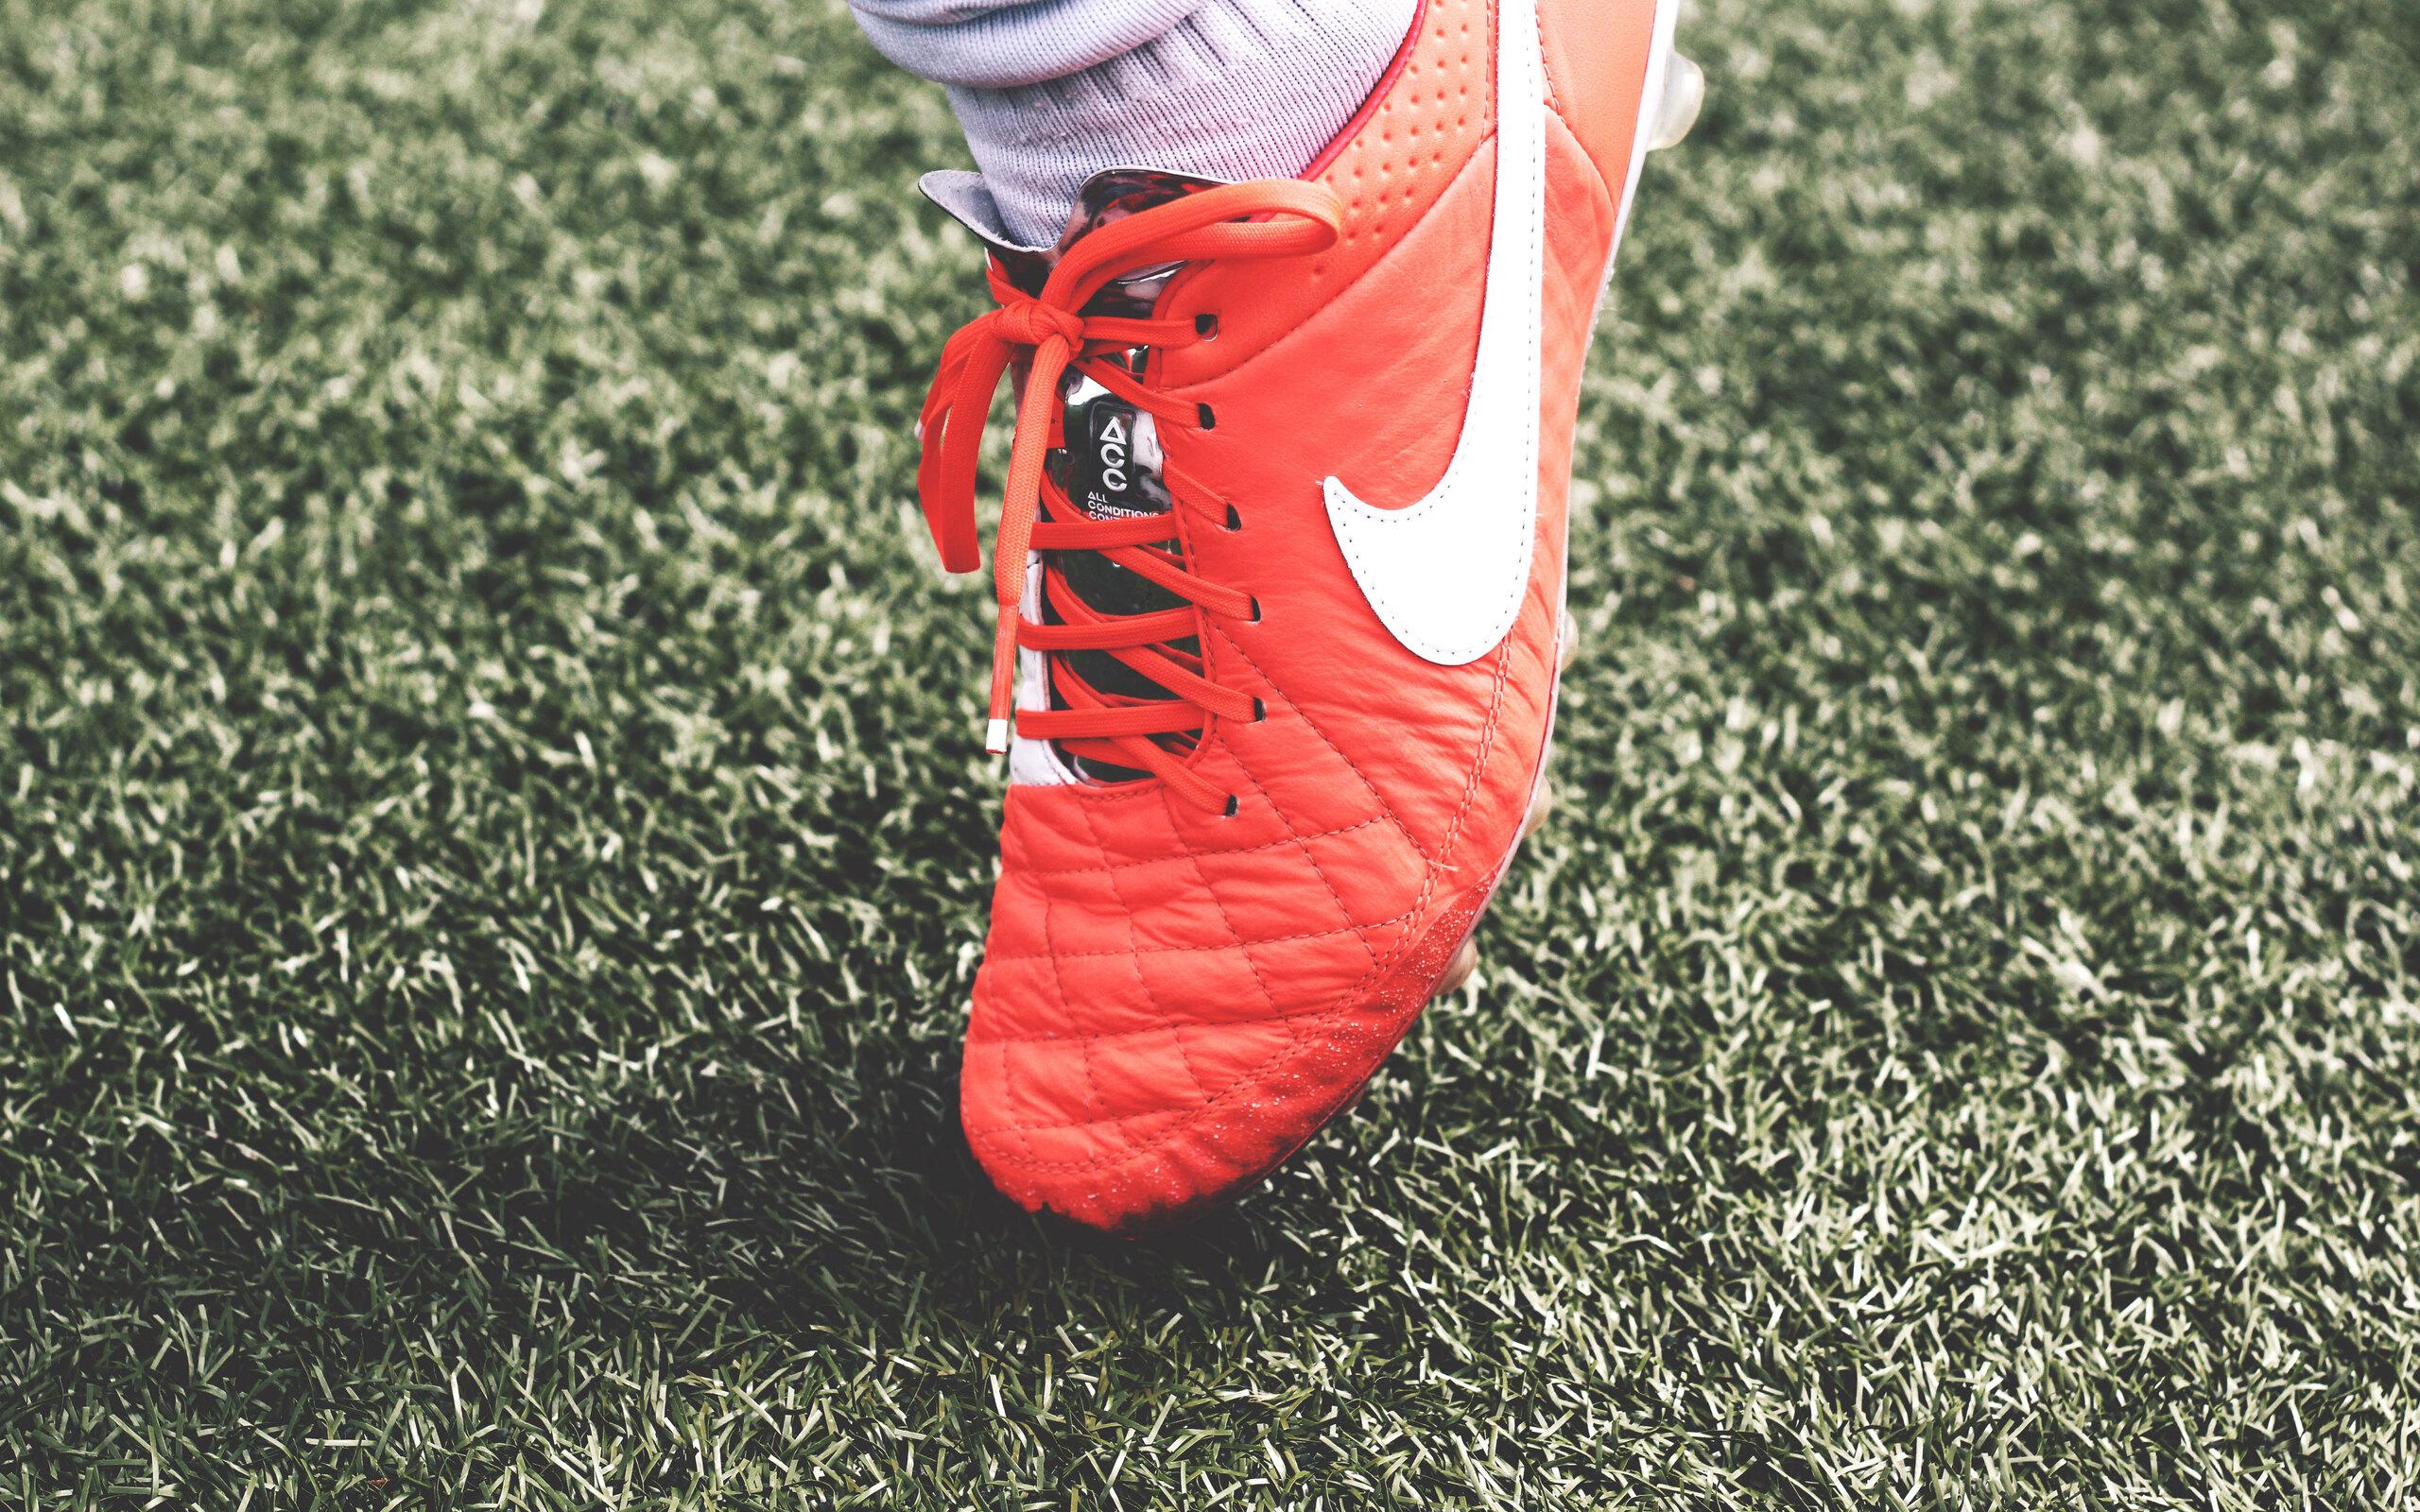 nike-shoes-ground-football-2s.jpg